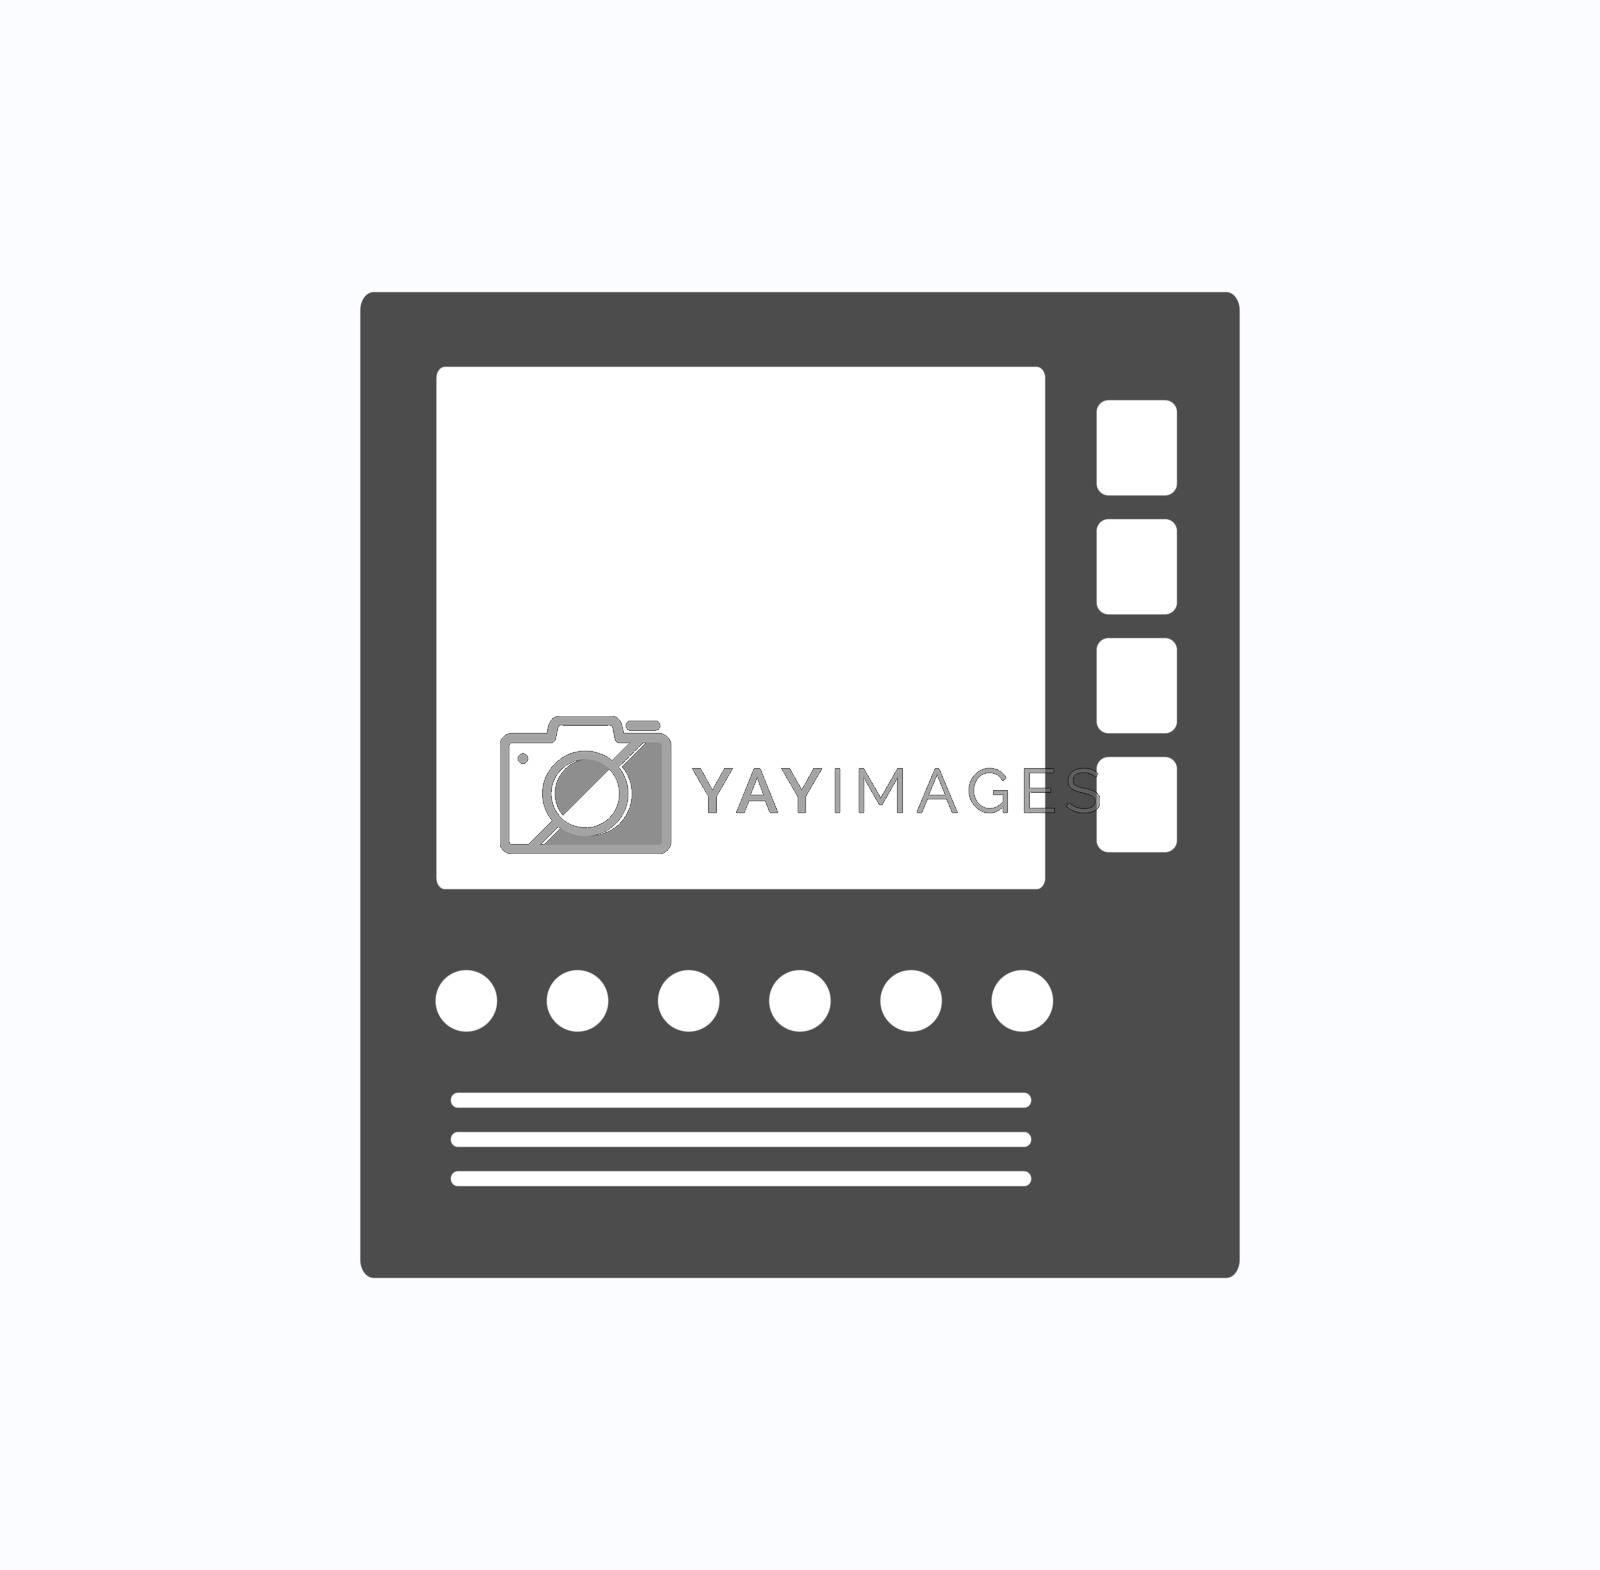 Intercom for communication by Alexzel